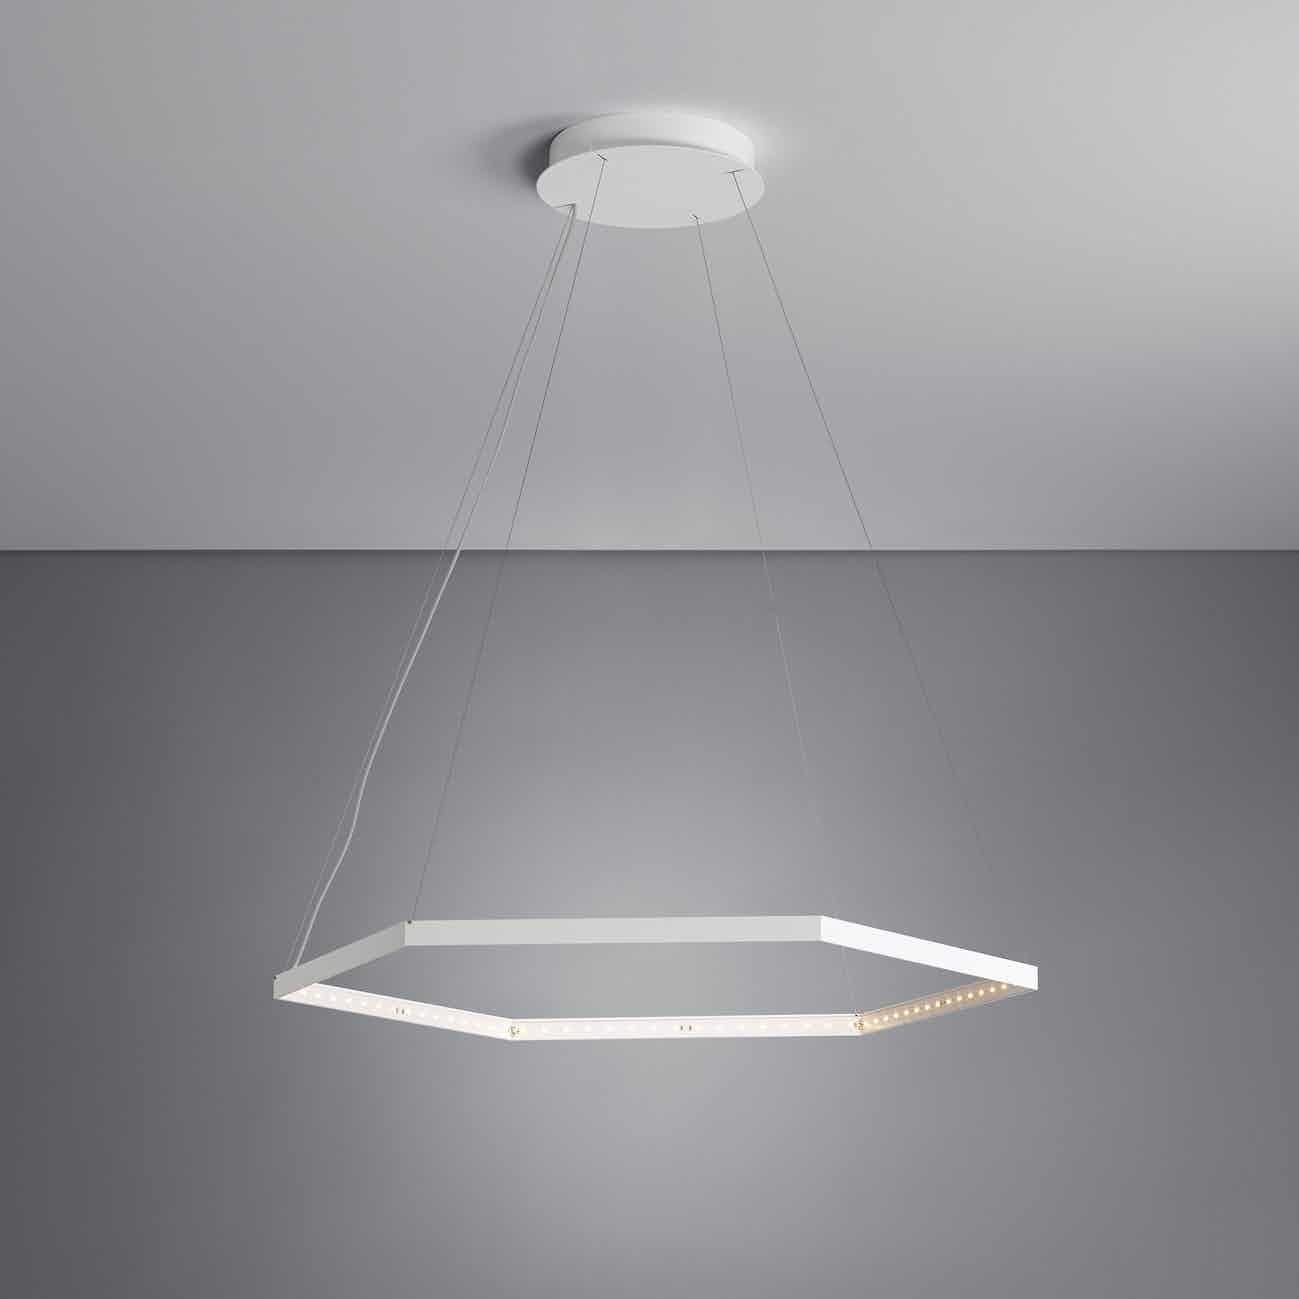 Le-deun-luminaires-hexa-1-hanging-lamp-white-ceiling-haute-living